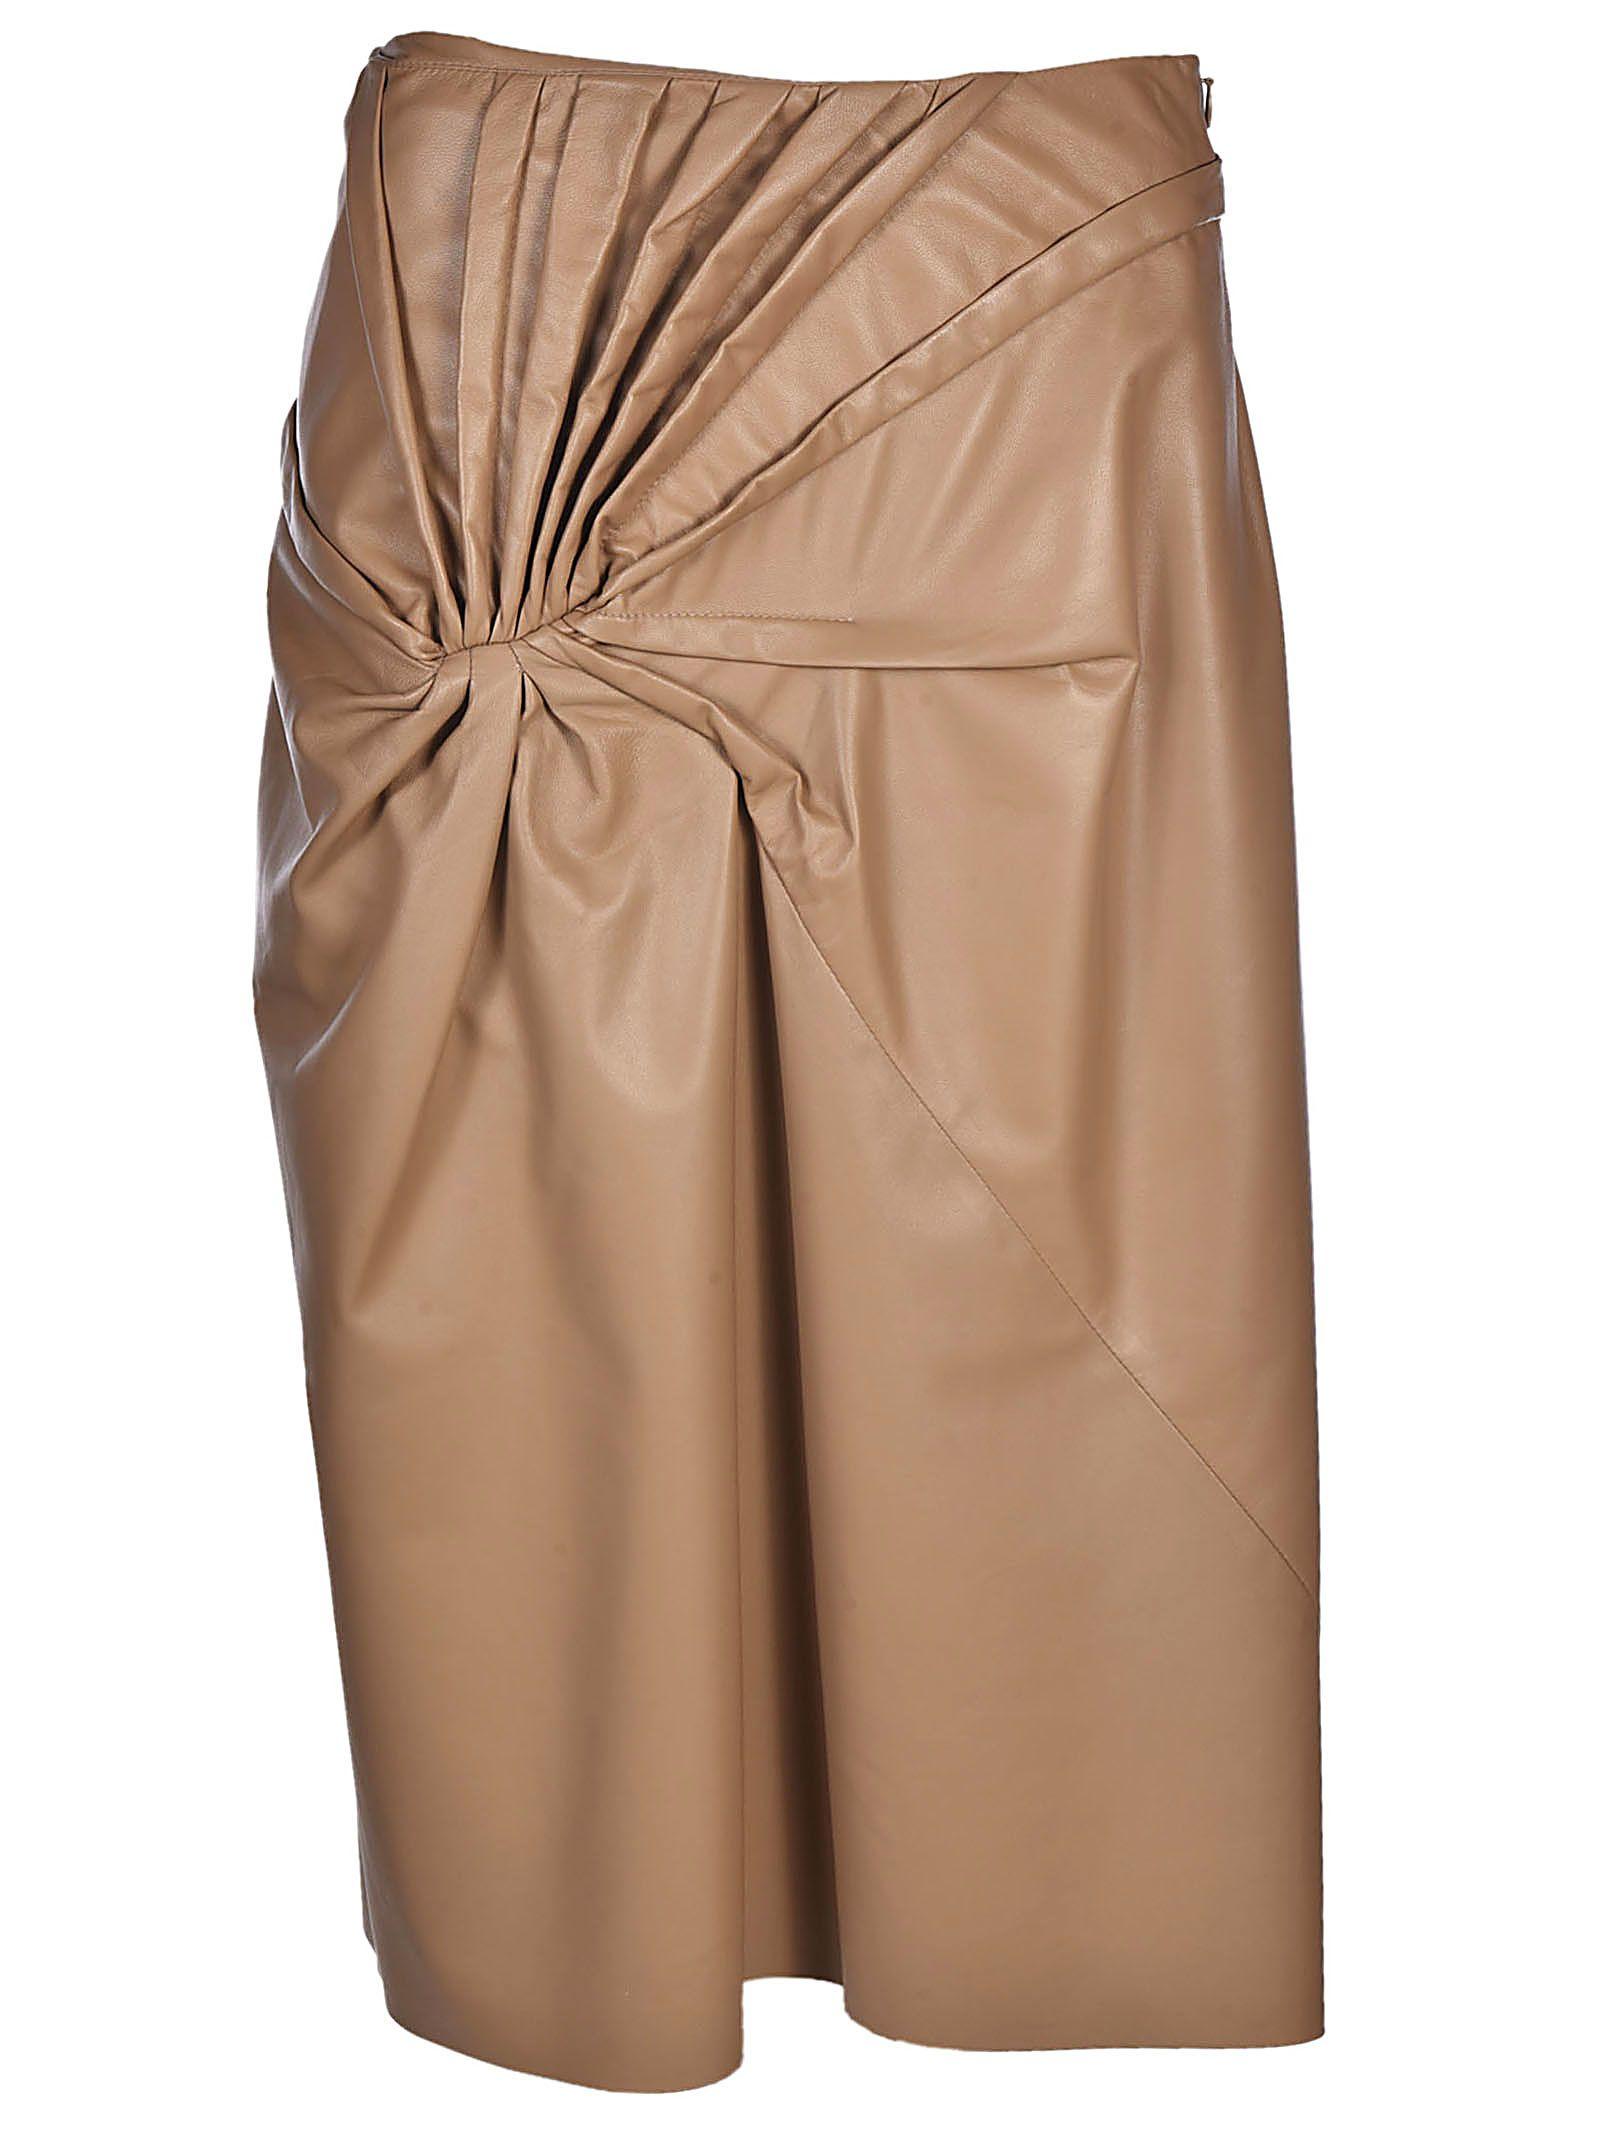 drapes rust front draped viscose spring knit official crepe shop asymmetrical site skirt tibi